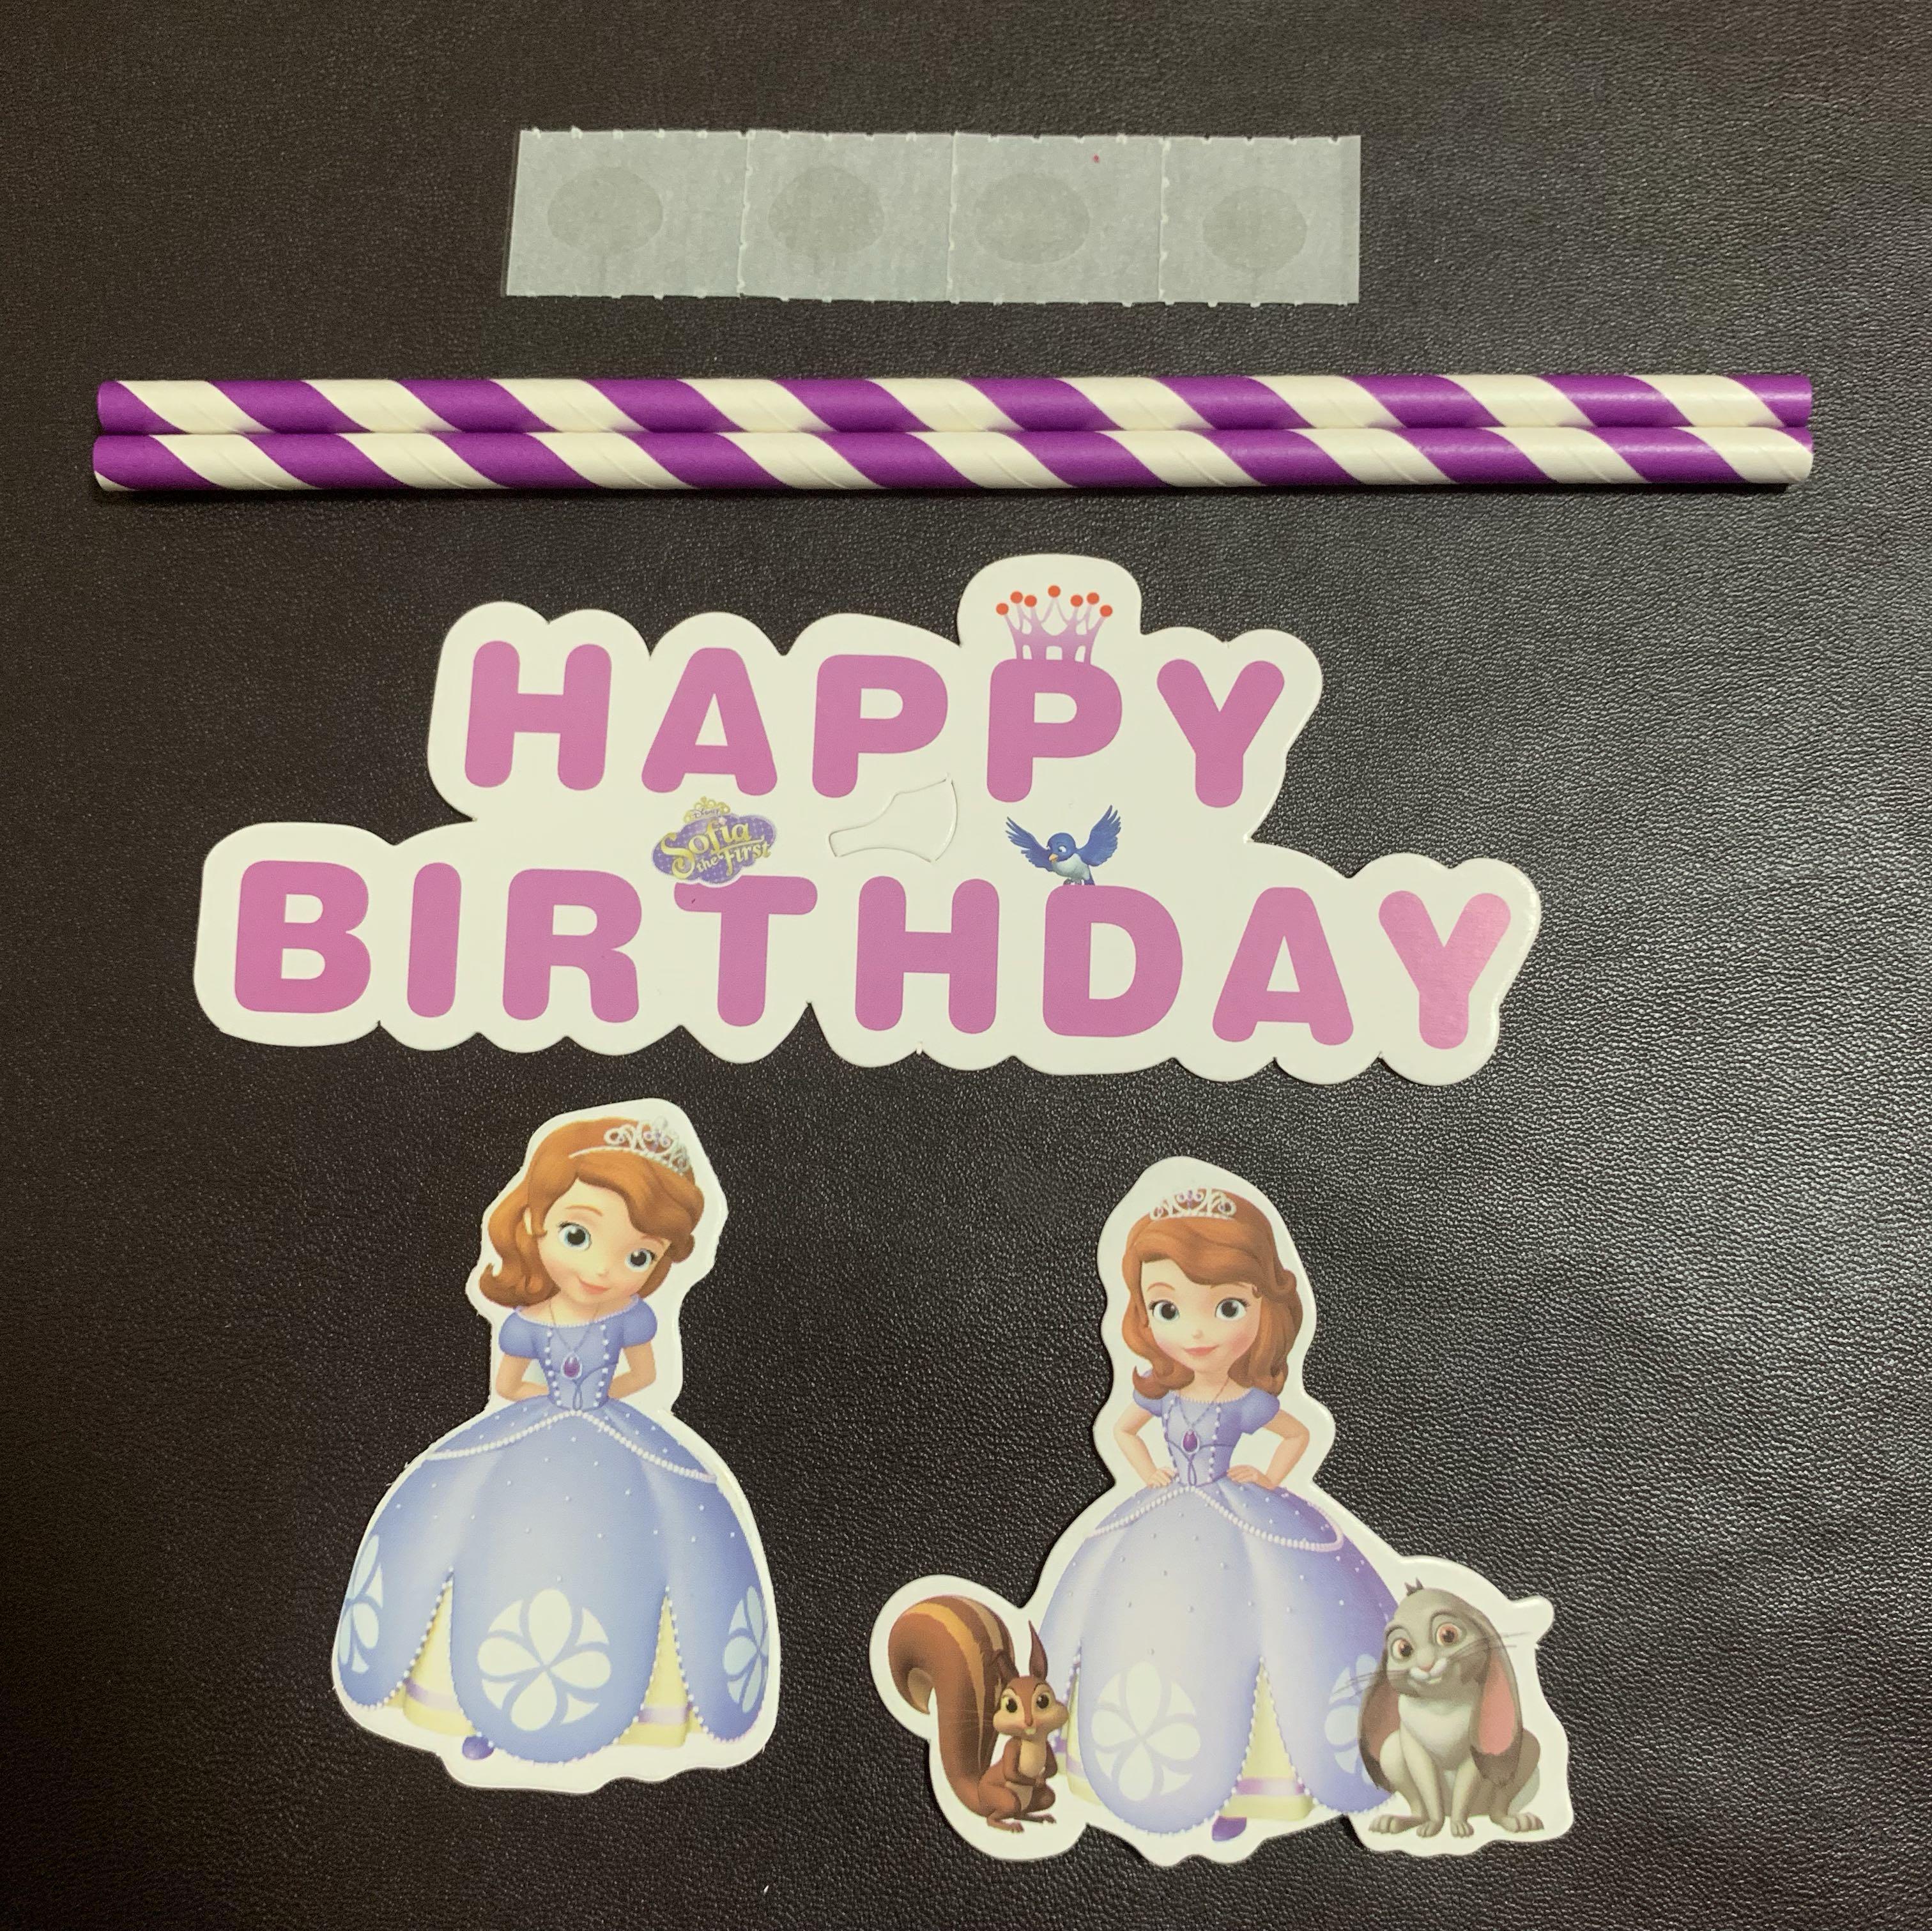 Groovy Princess Sofia The First Happy Birthday Cake Topper Design Funny Birthday Cards Online Inifodamsfinfo